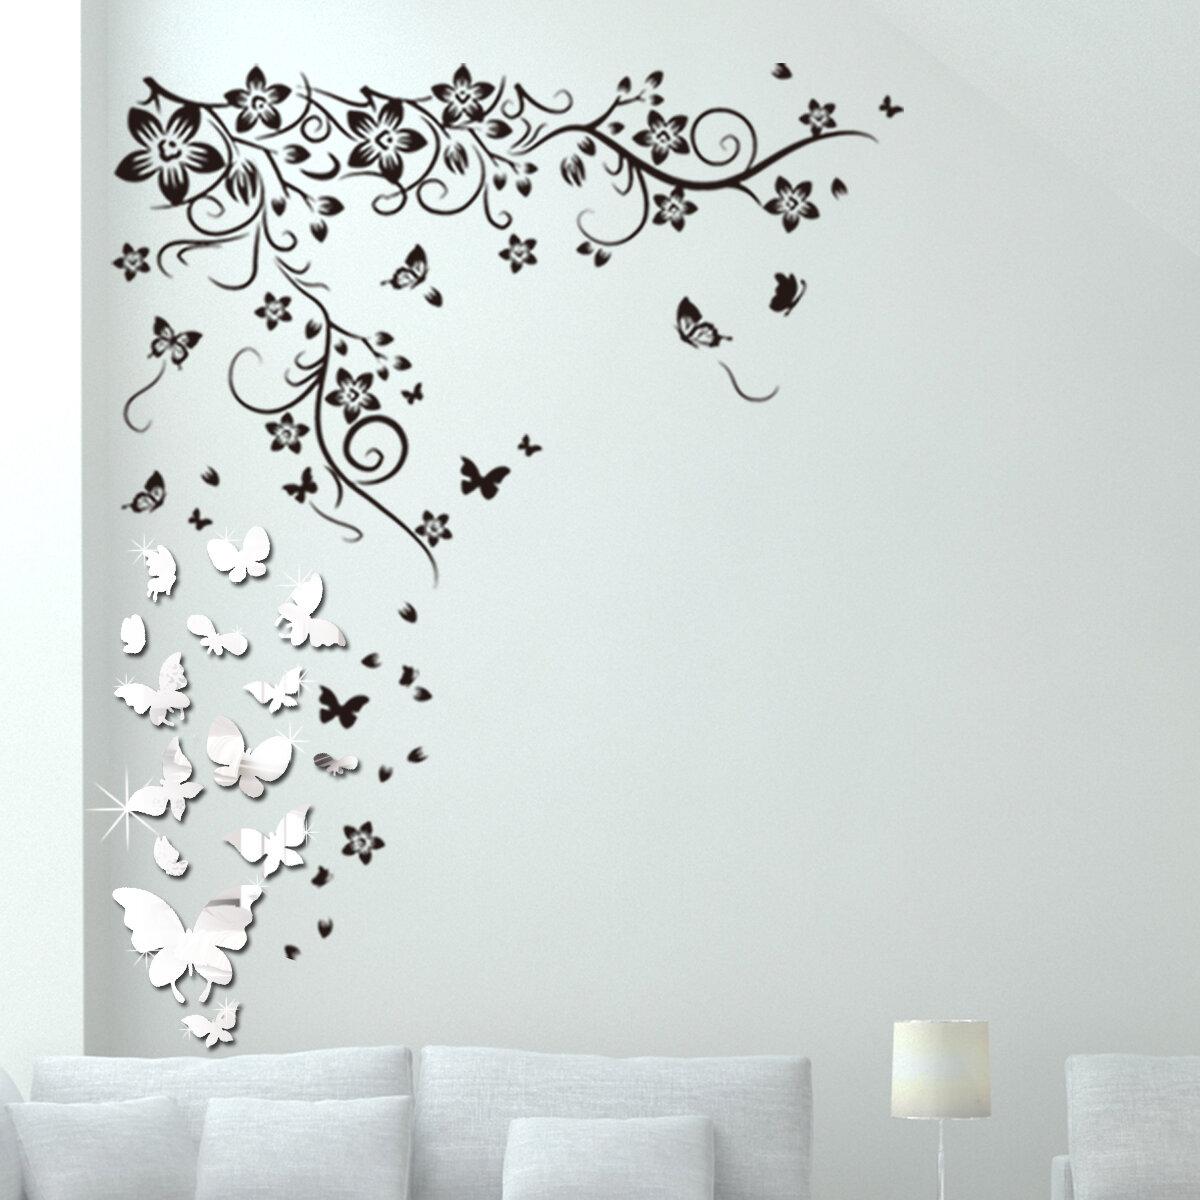 Tapeten Walplus Mirror Butterflies With Butterflies Vine Wall Sticker Set Decorations Heimwerker